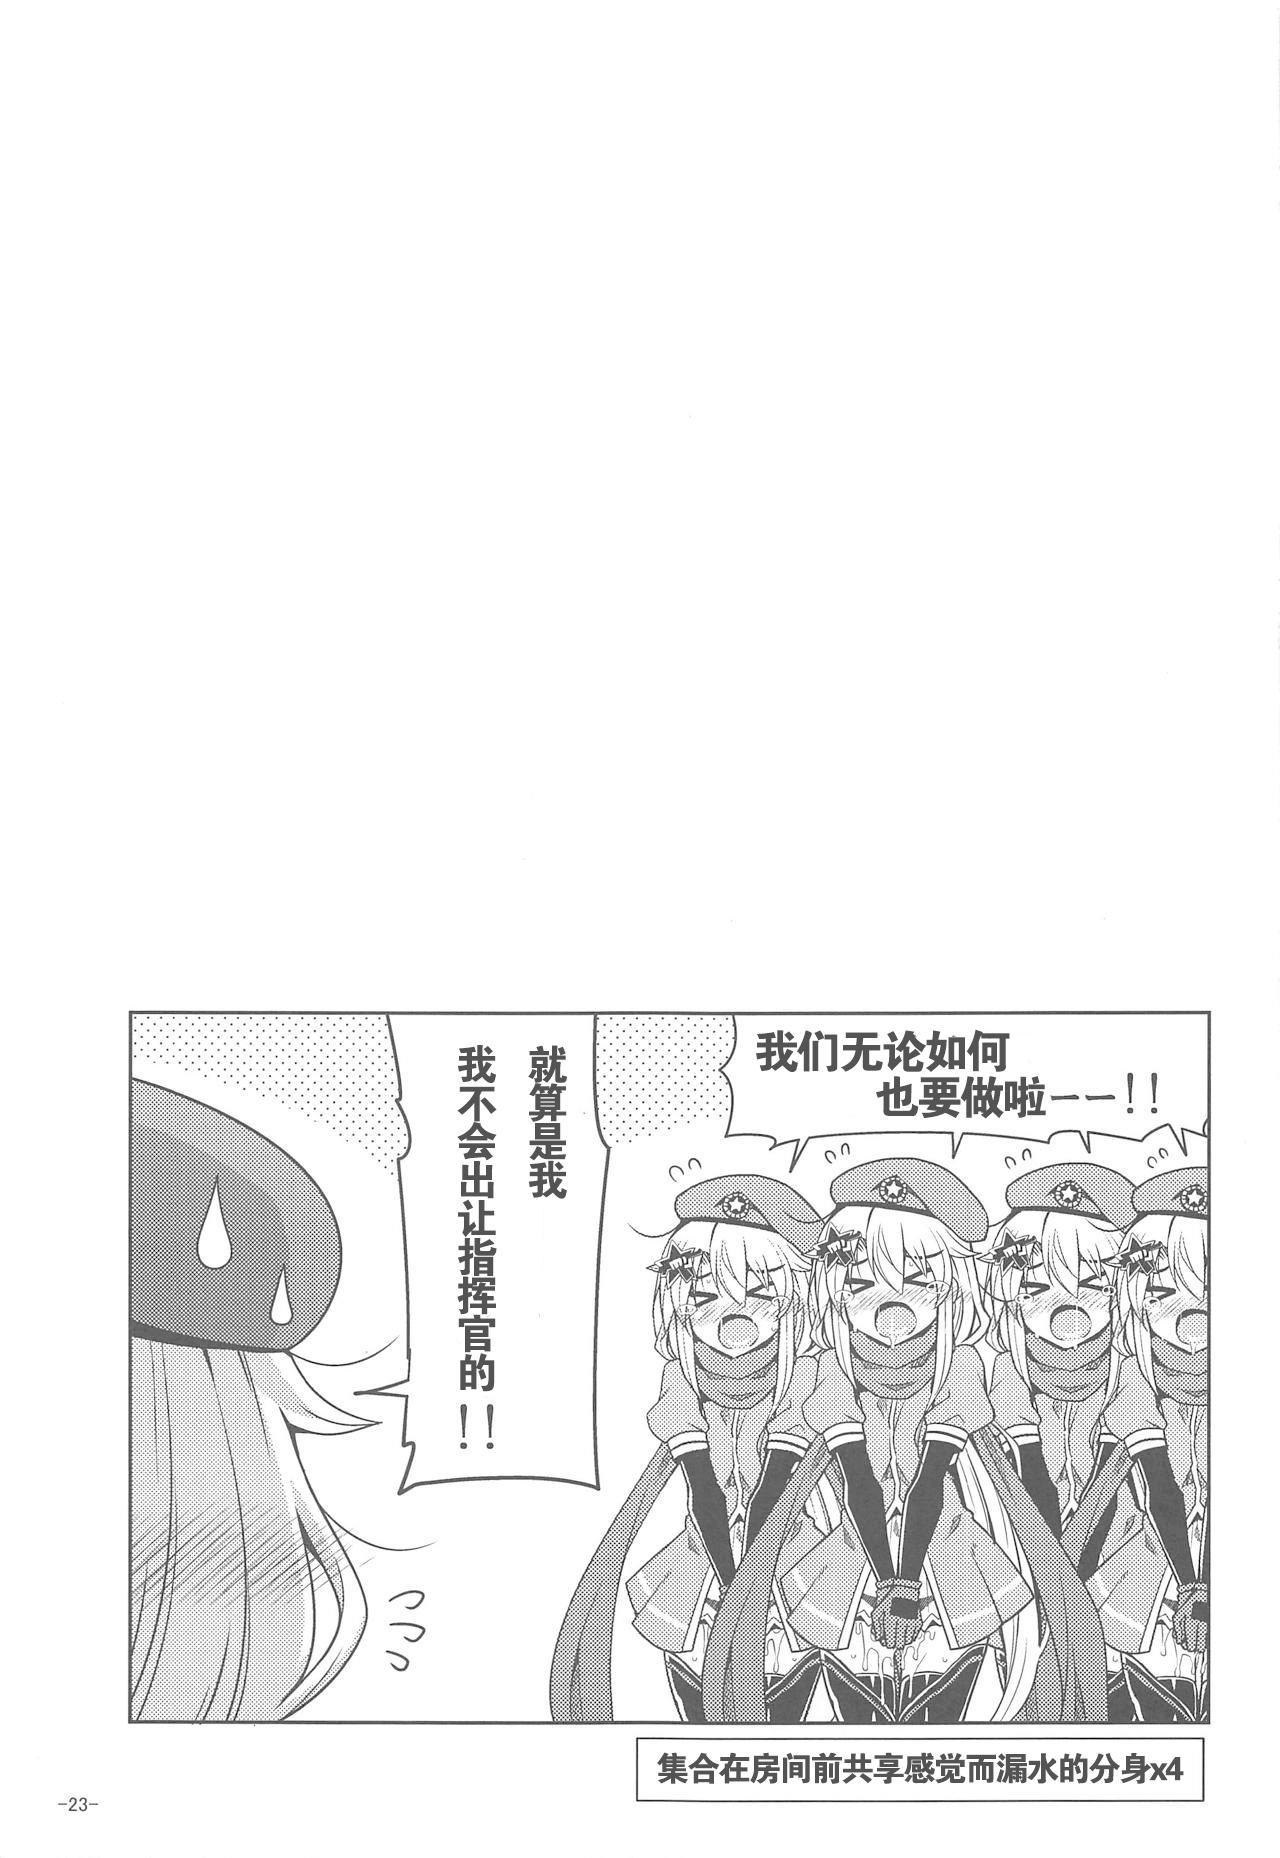 (C95) [Dokomademo Aoi Sora ni Ukabu Niku. (Nikusoukyuu.)] 9a-91-chan wa Miraretai. (Girls' Frontline) [Chinese] [v.v.t.m汉化组] 22